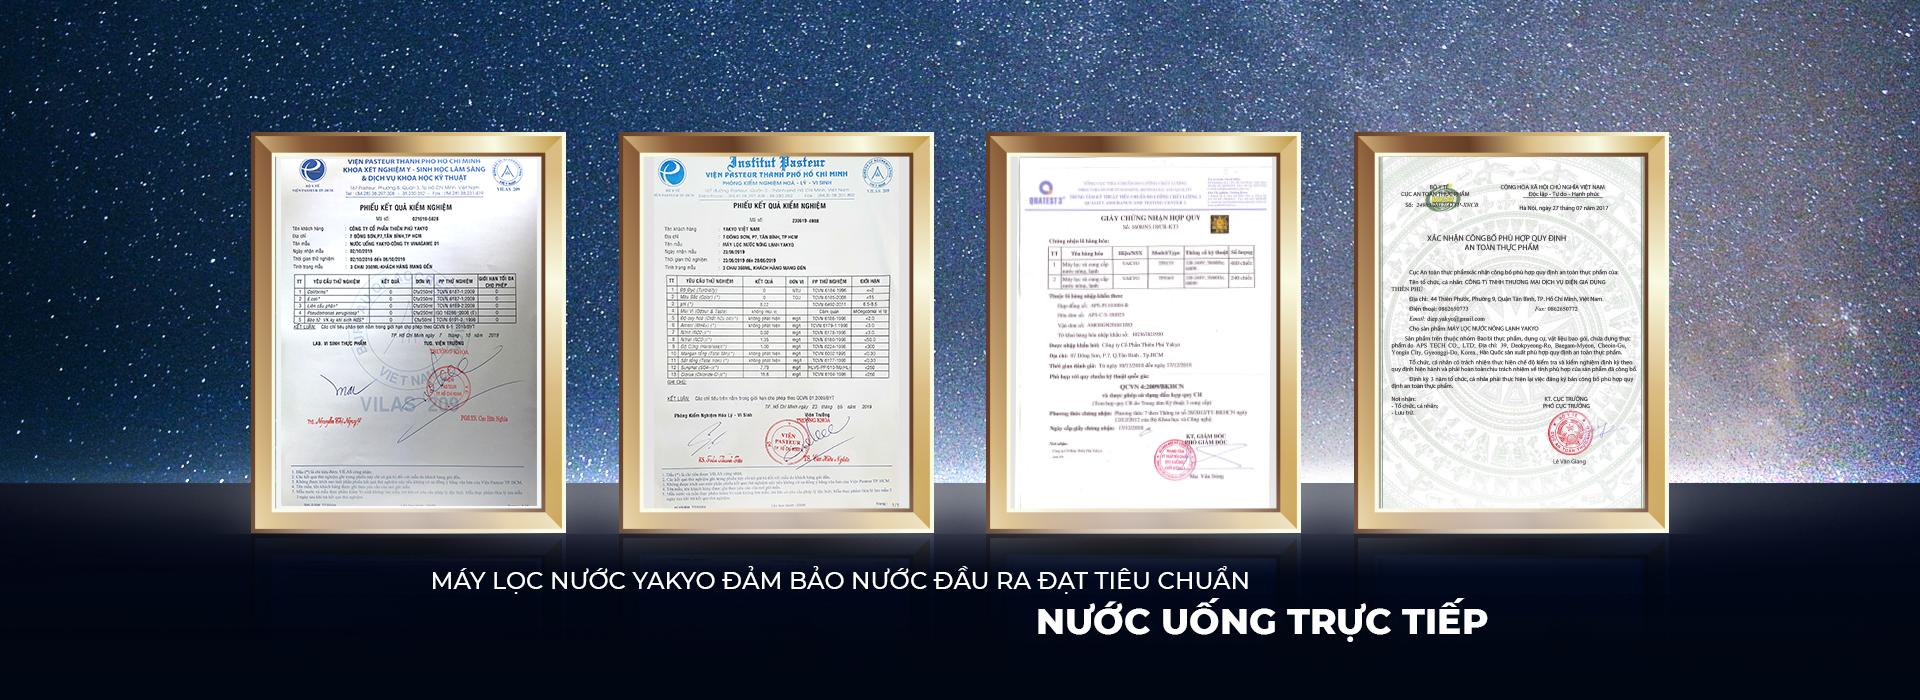 may-loc-nuoc-yakyo-dat-chuan-nuoc-uong-truc-tiep